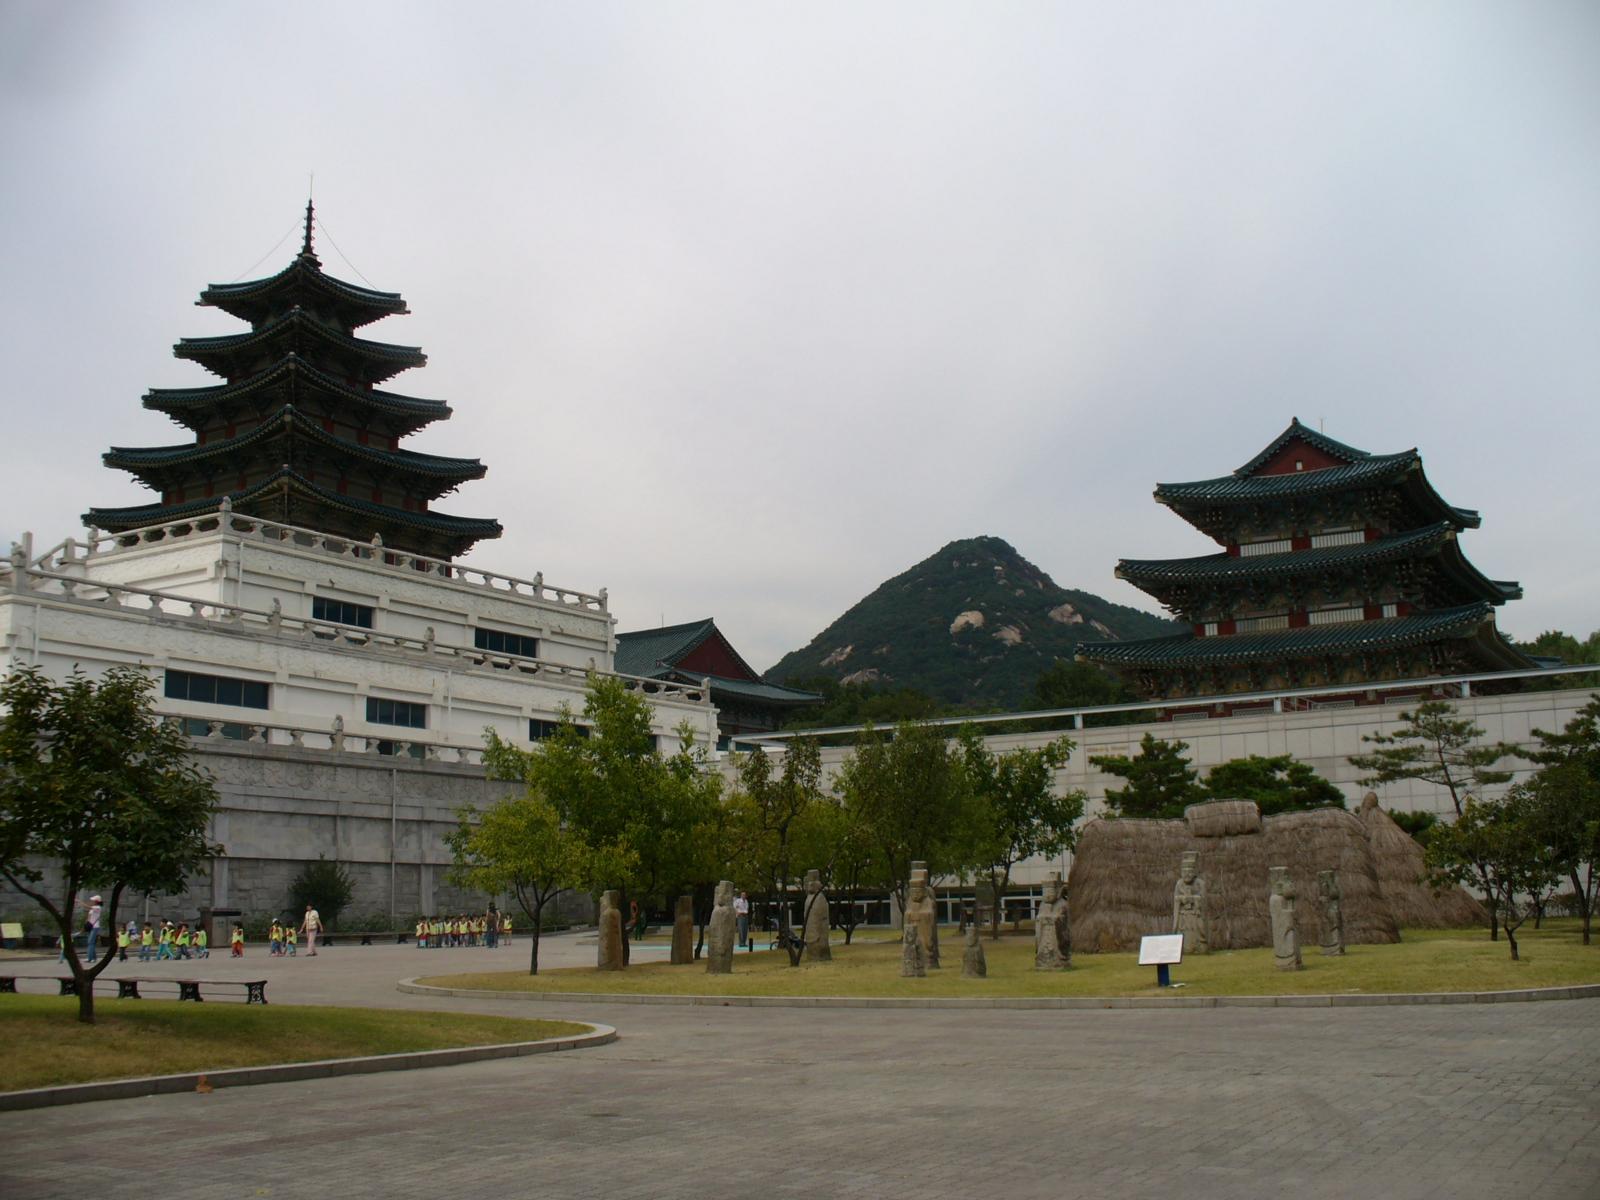 folkloremuseum